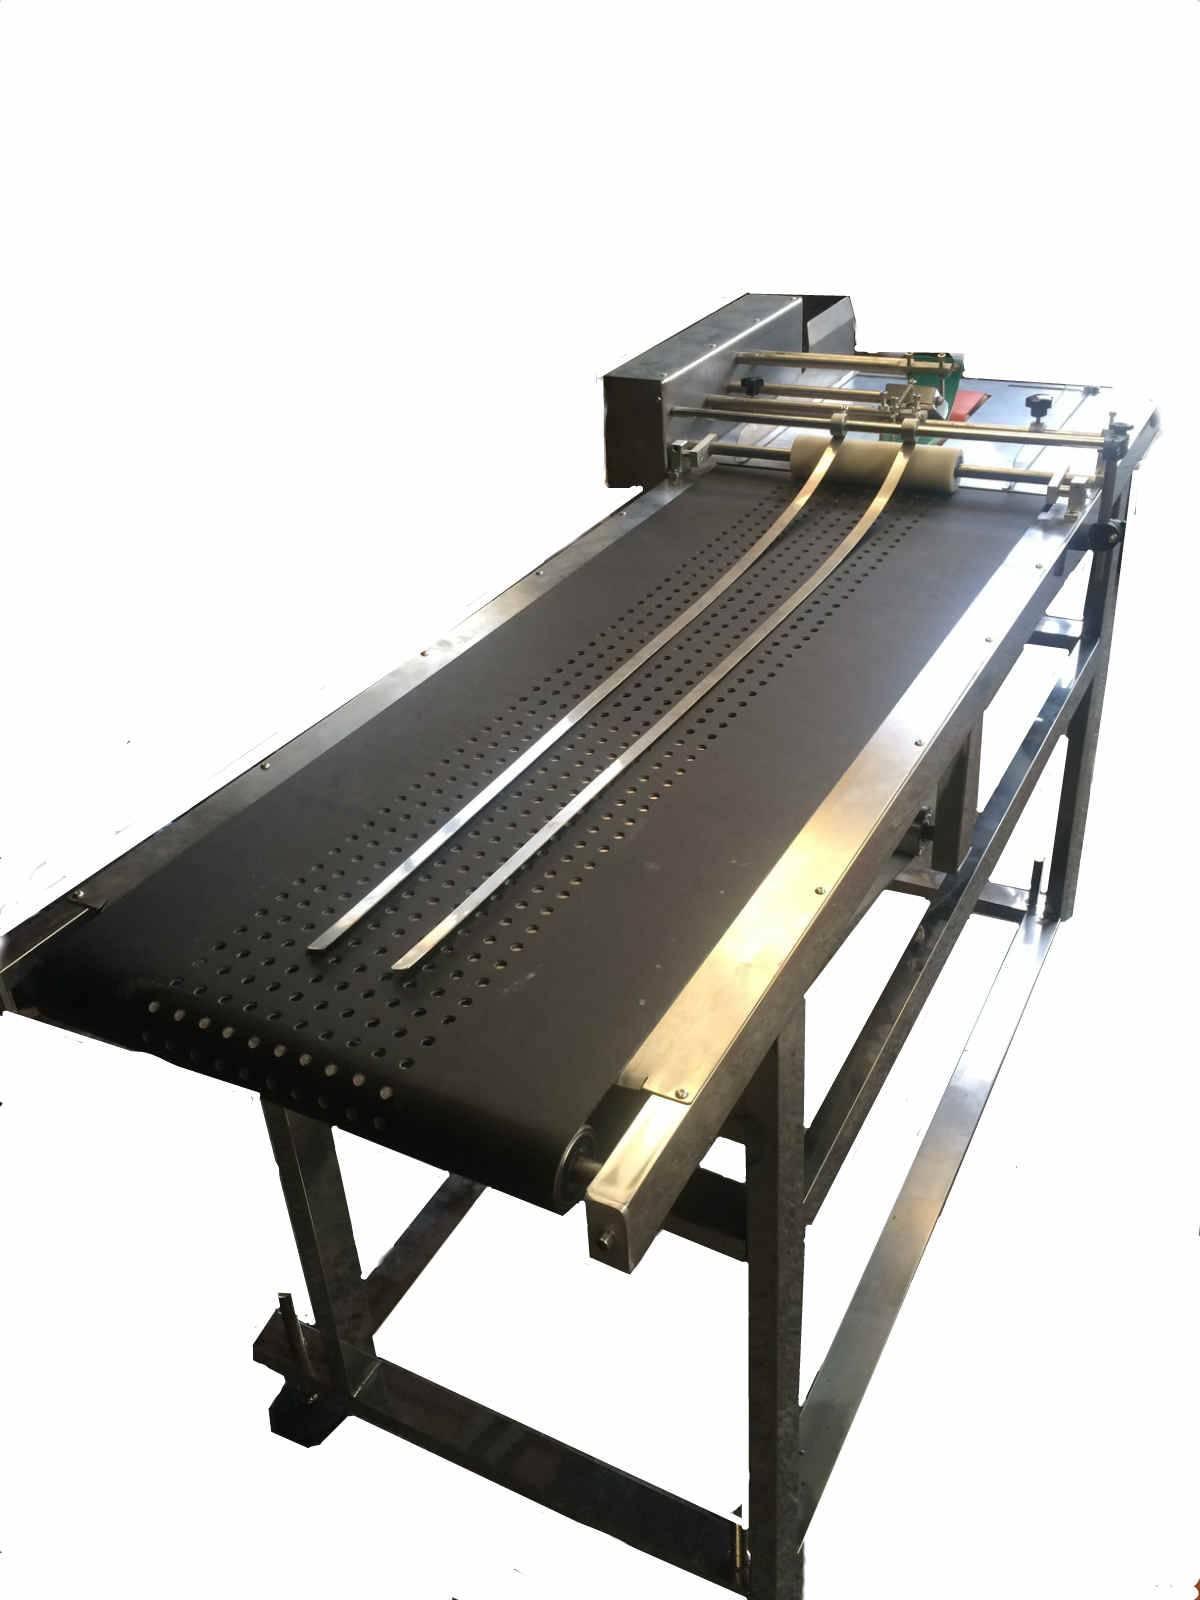 Adsorption type paging machine